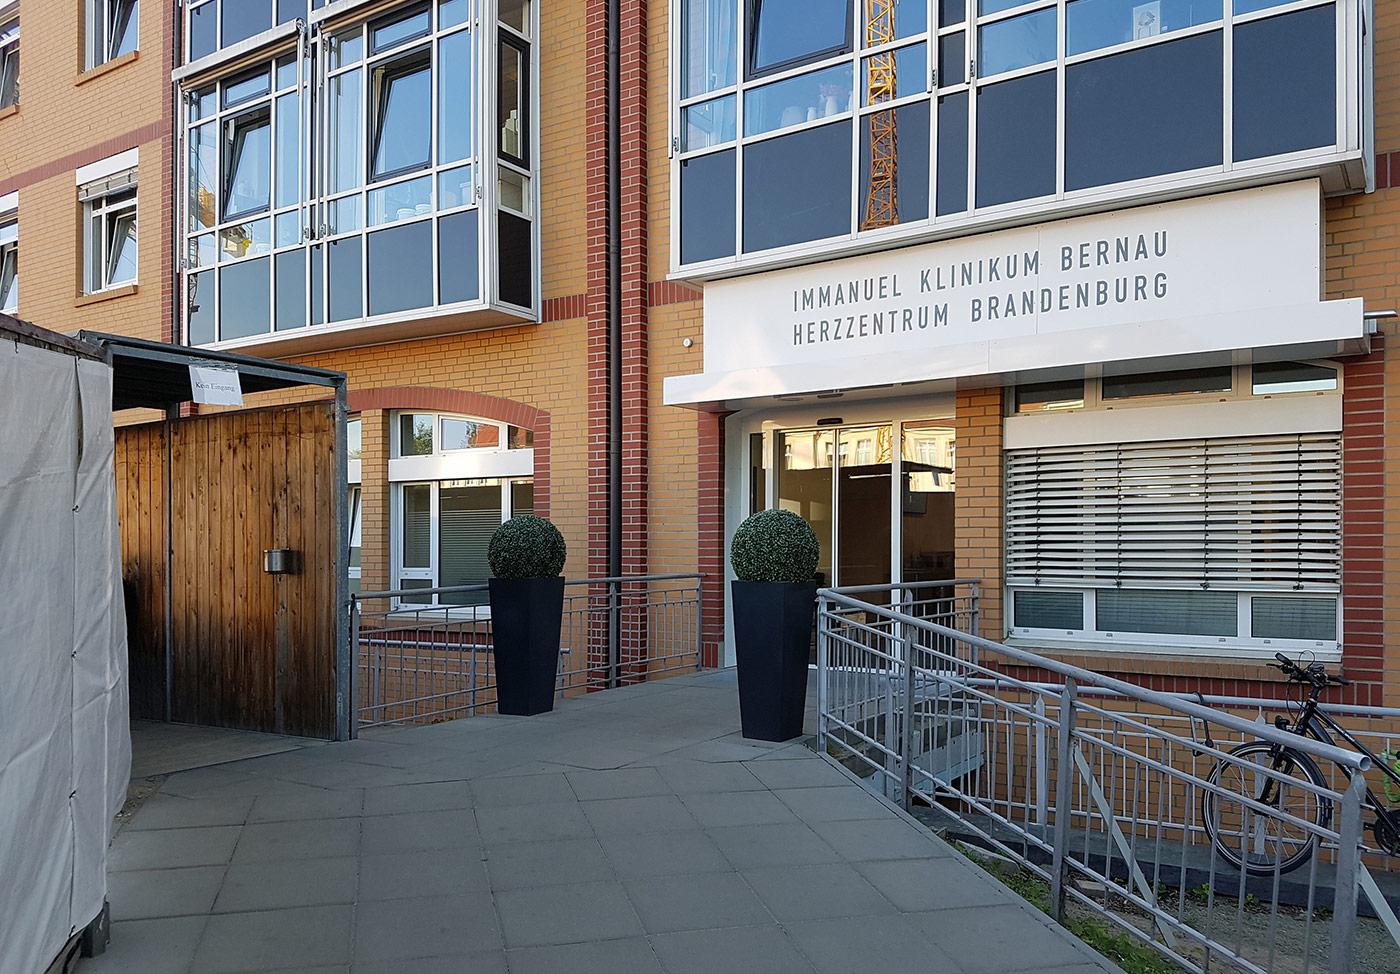 Immanuel Klinikum Bernau - Neubau - Bild 2